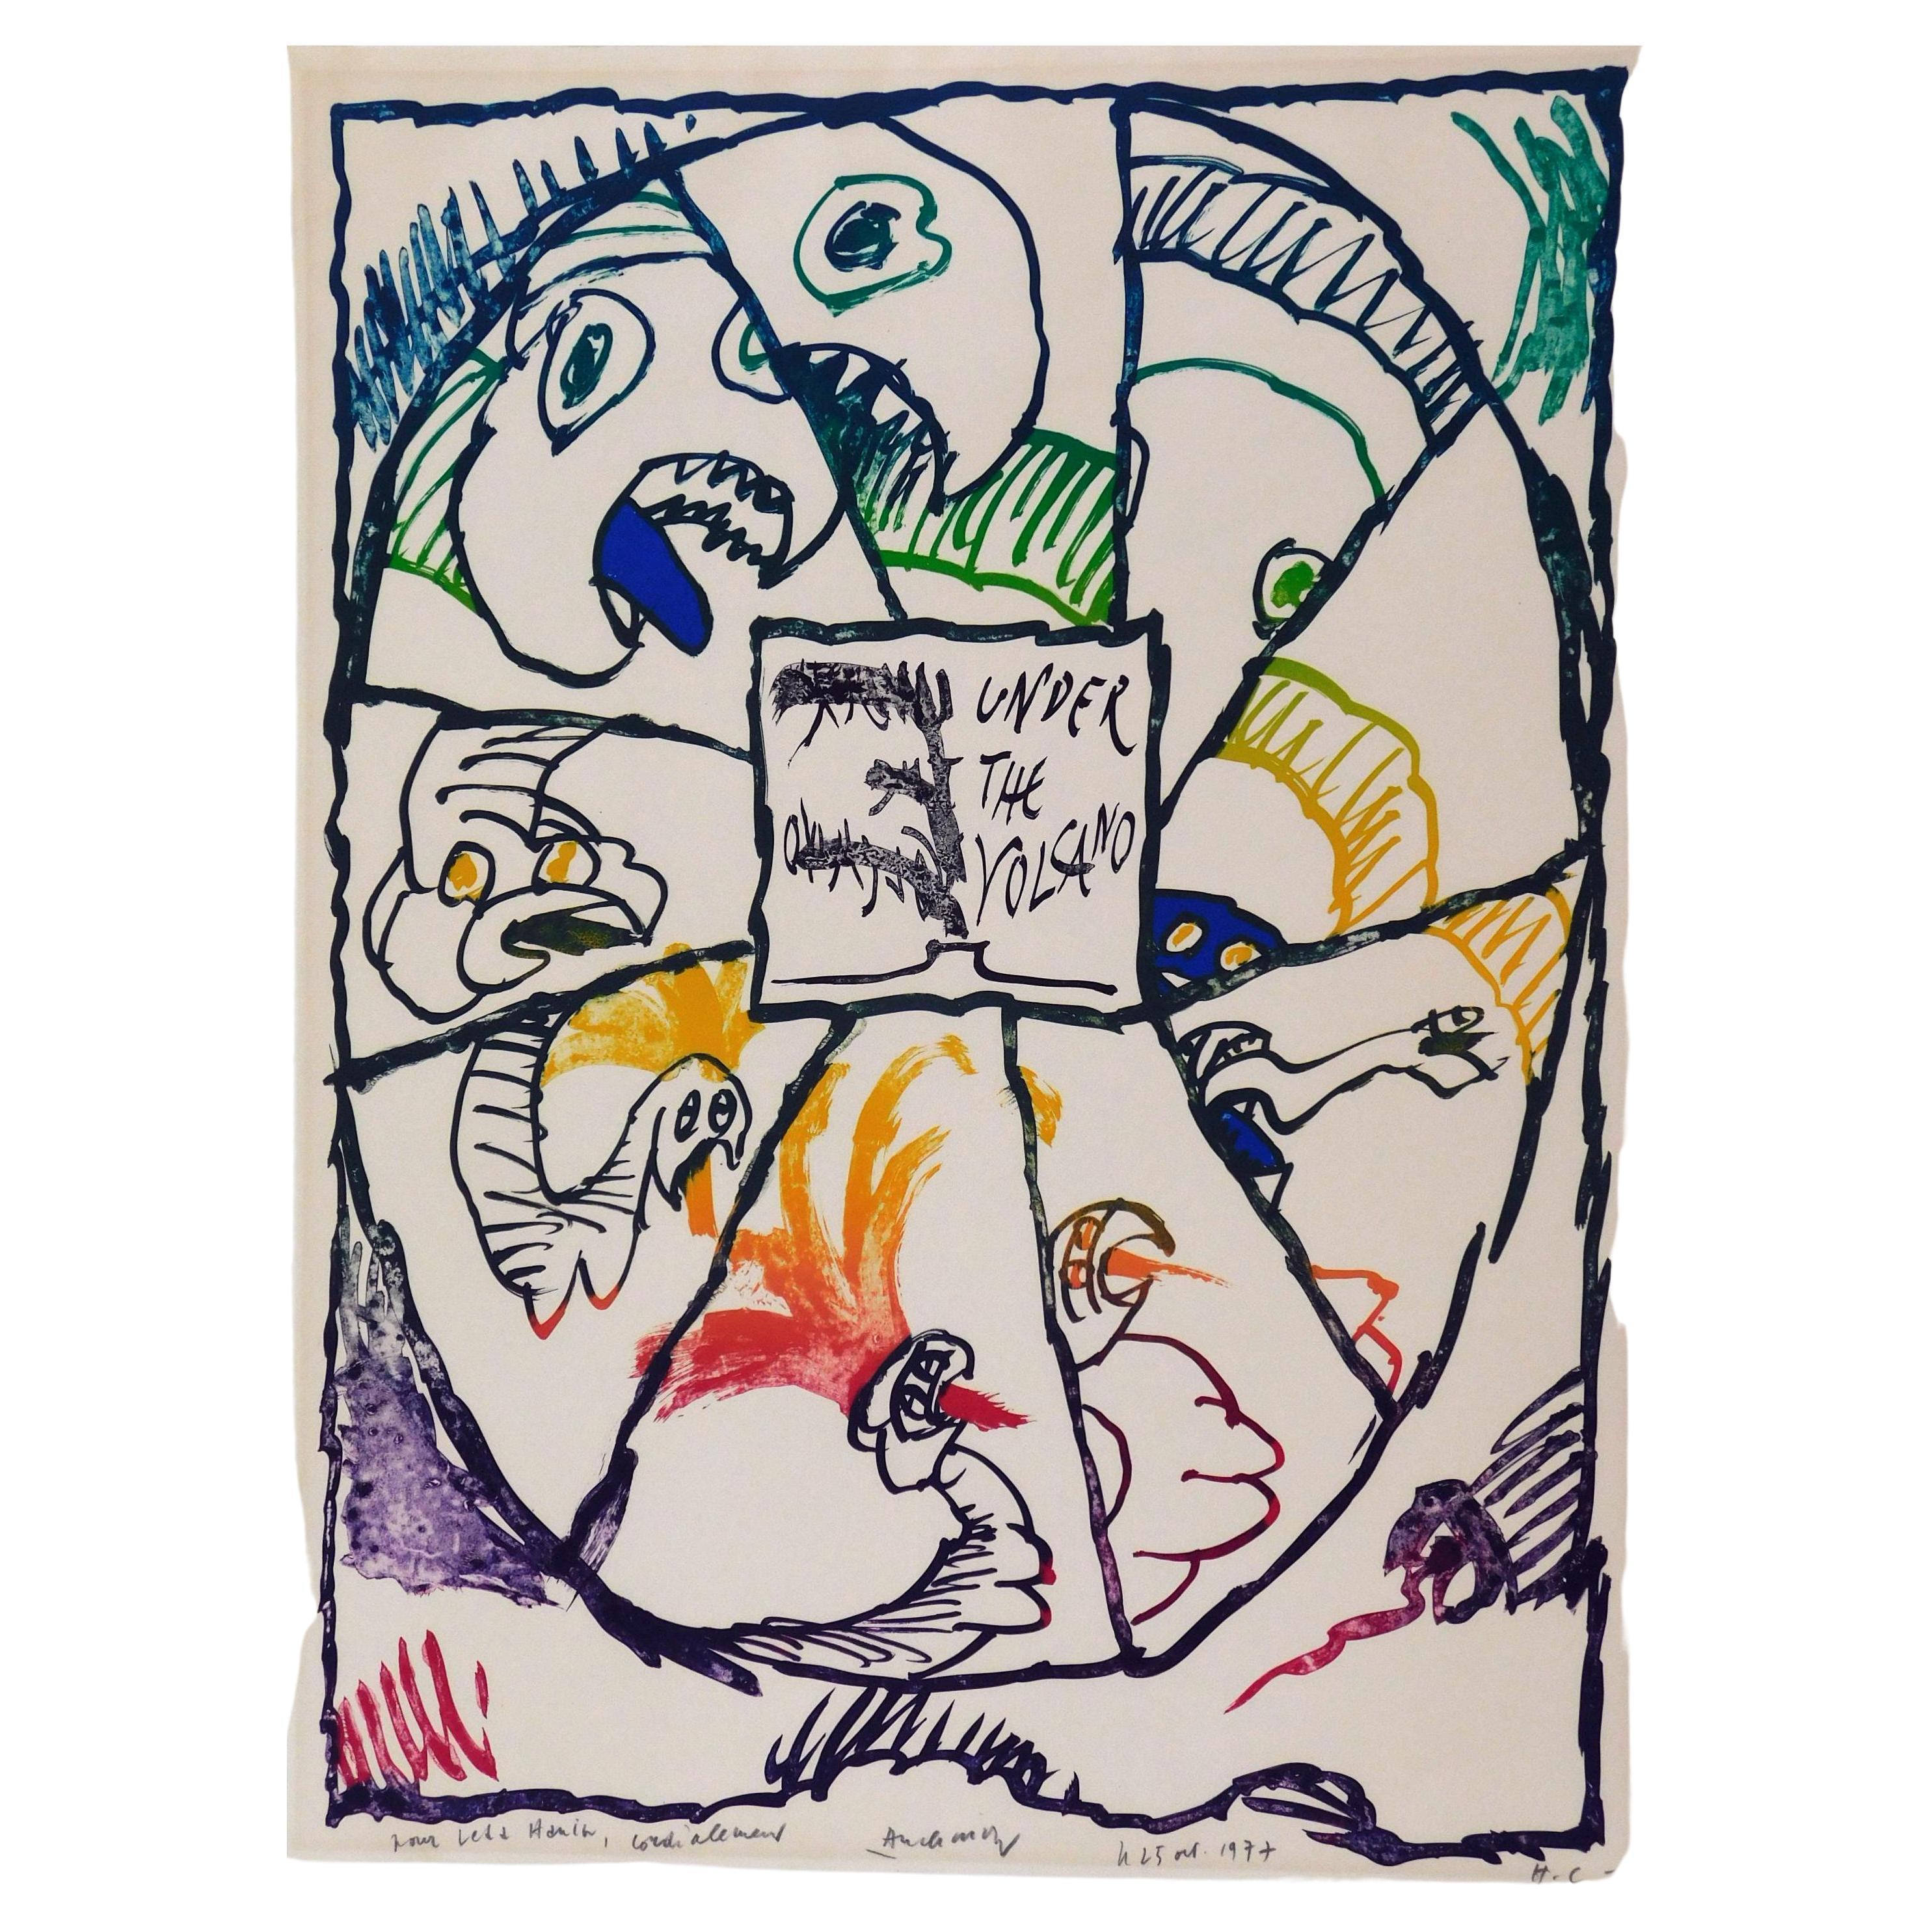 Pierre Alechinsky CoBra Artist Color Lithograph, 1977, Under the Volcano